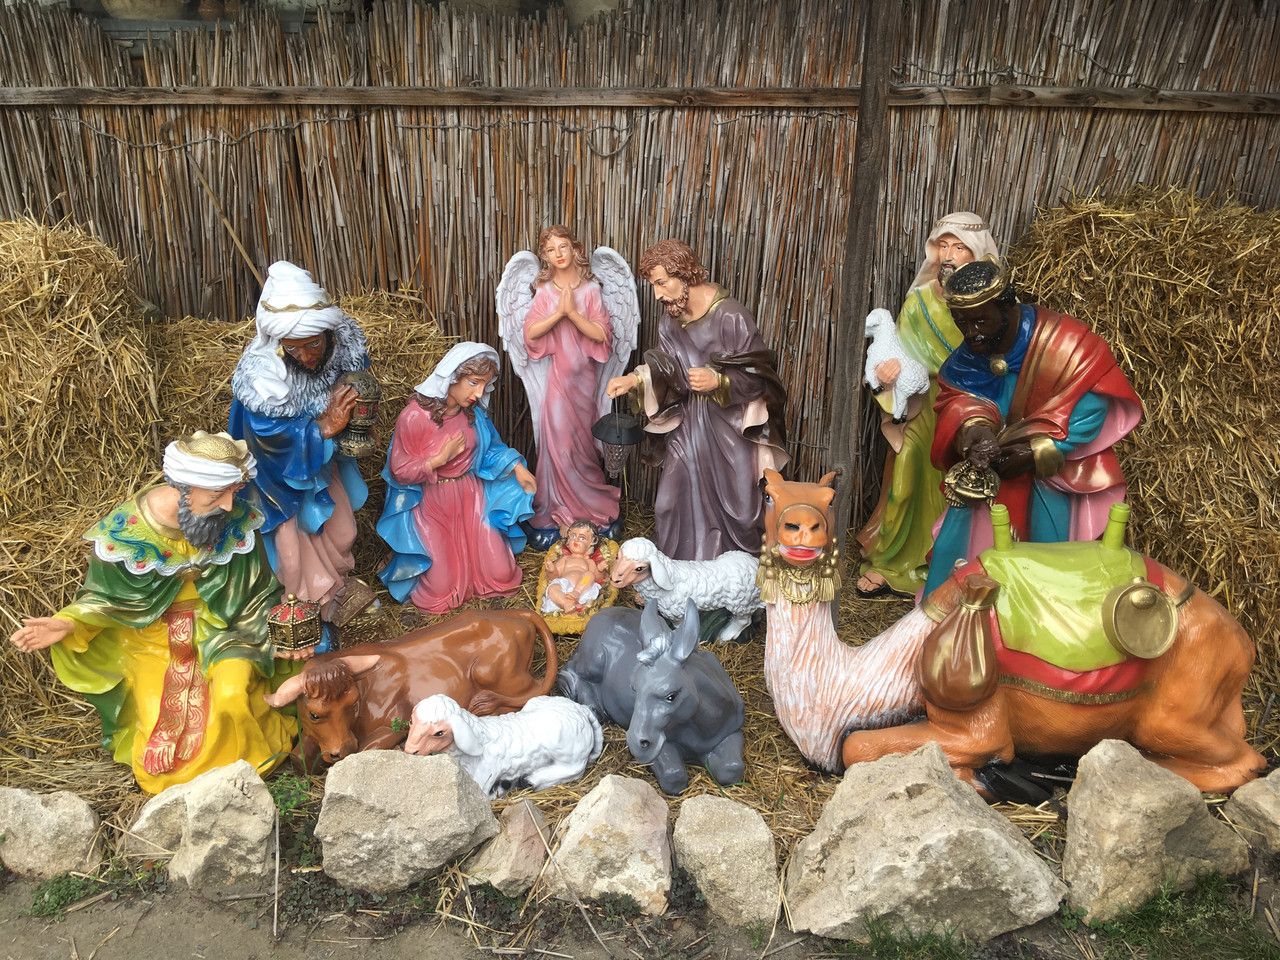 Рождественский вертеп в романском соборе (фото)   Кадр дня   DW ...   960x1280